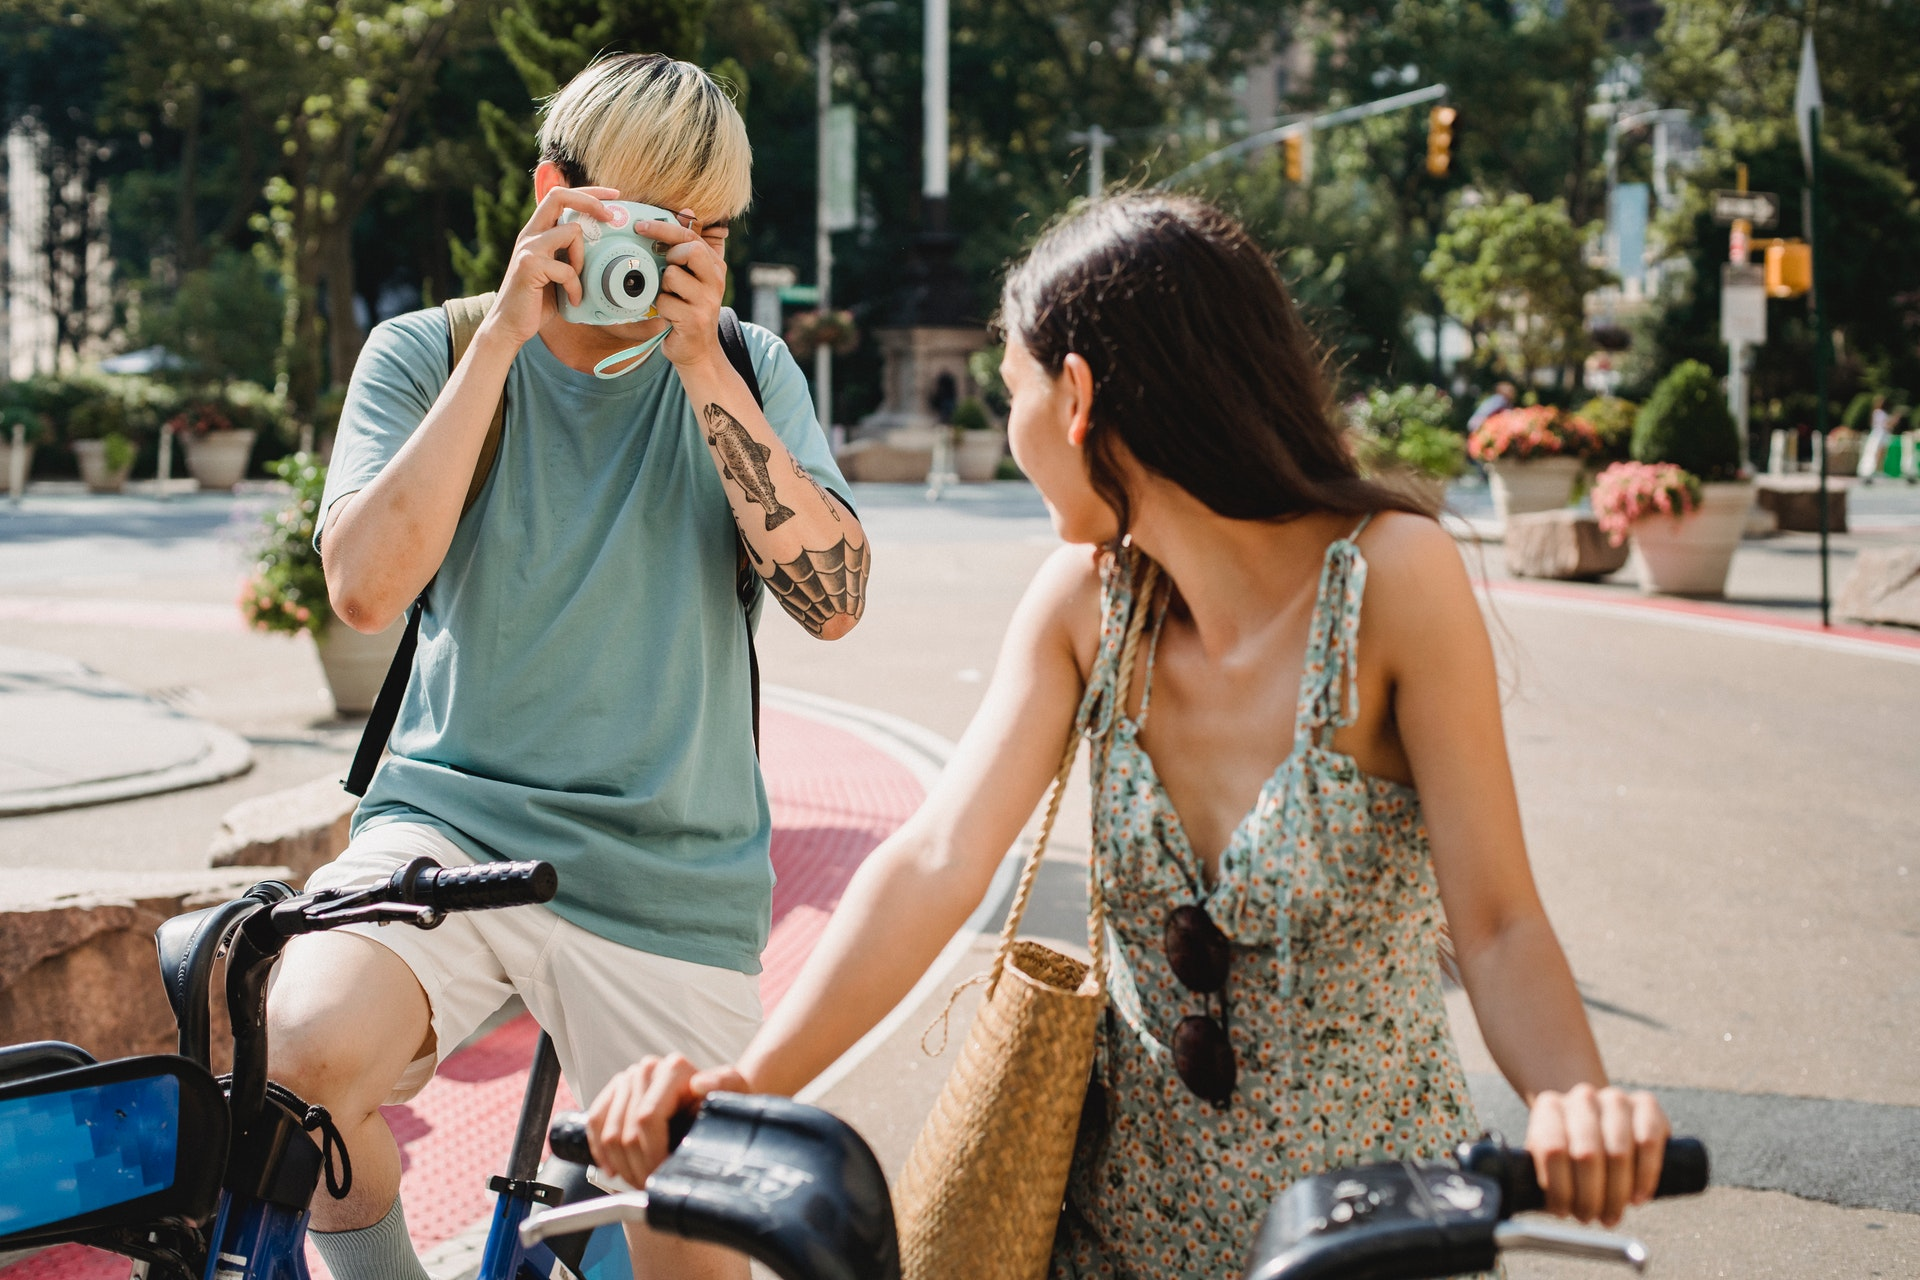 a man taking photo of a woman on bike